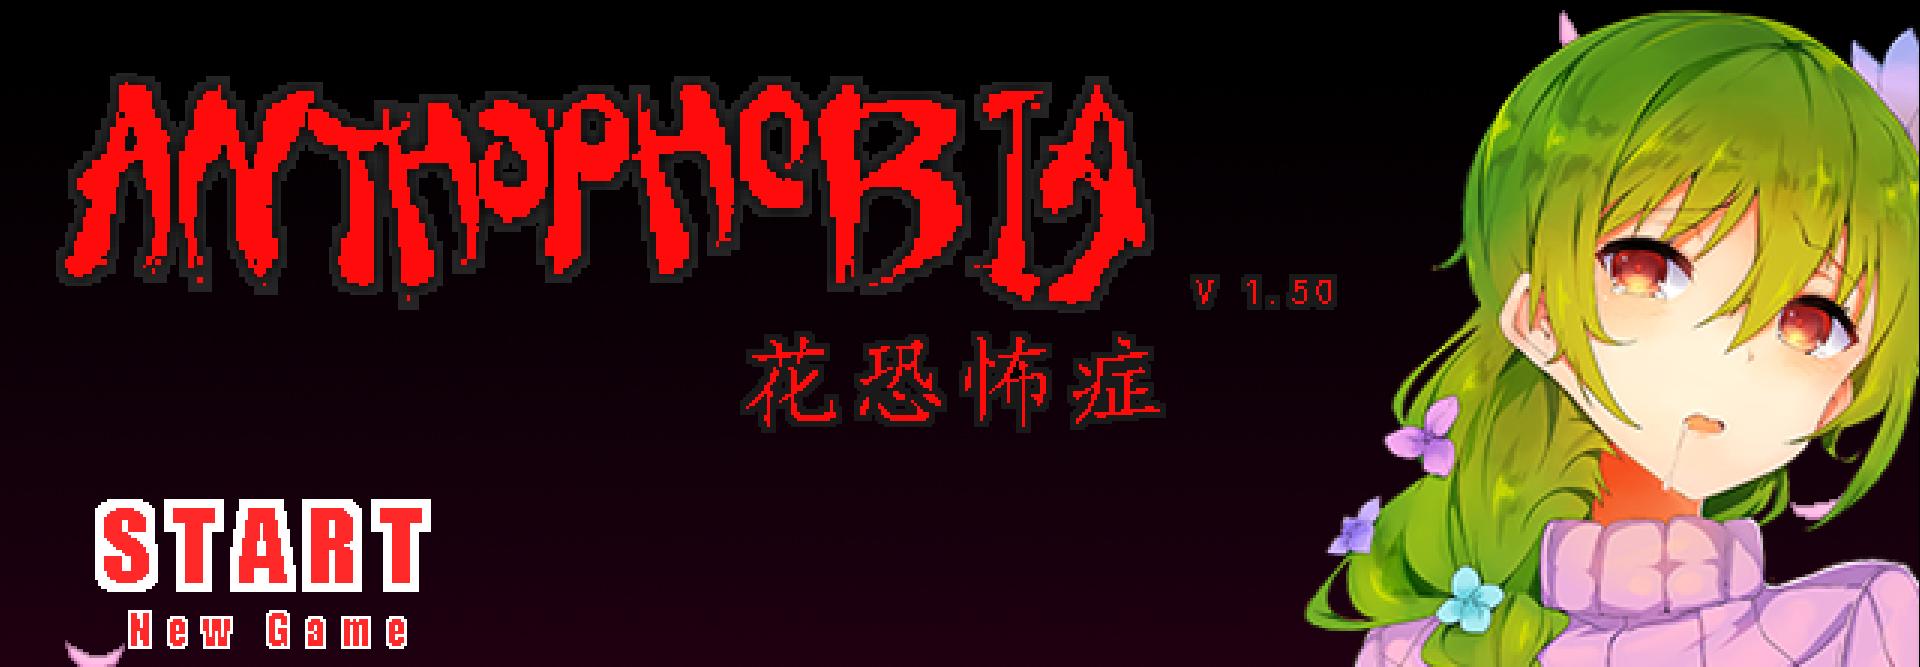 Hentai Game Anthophobia